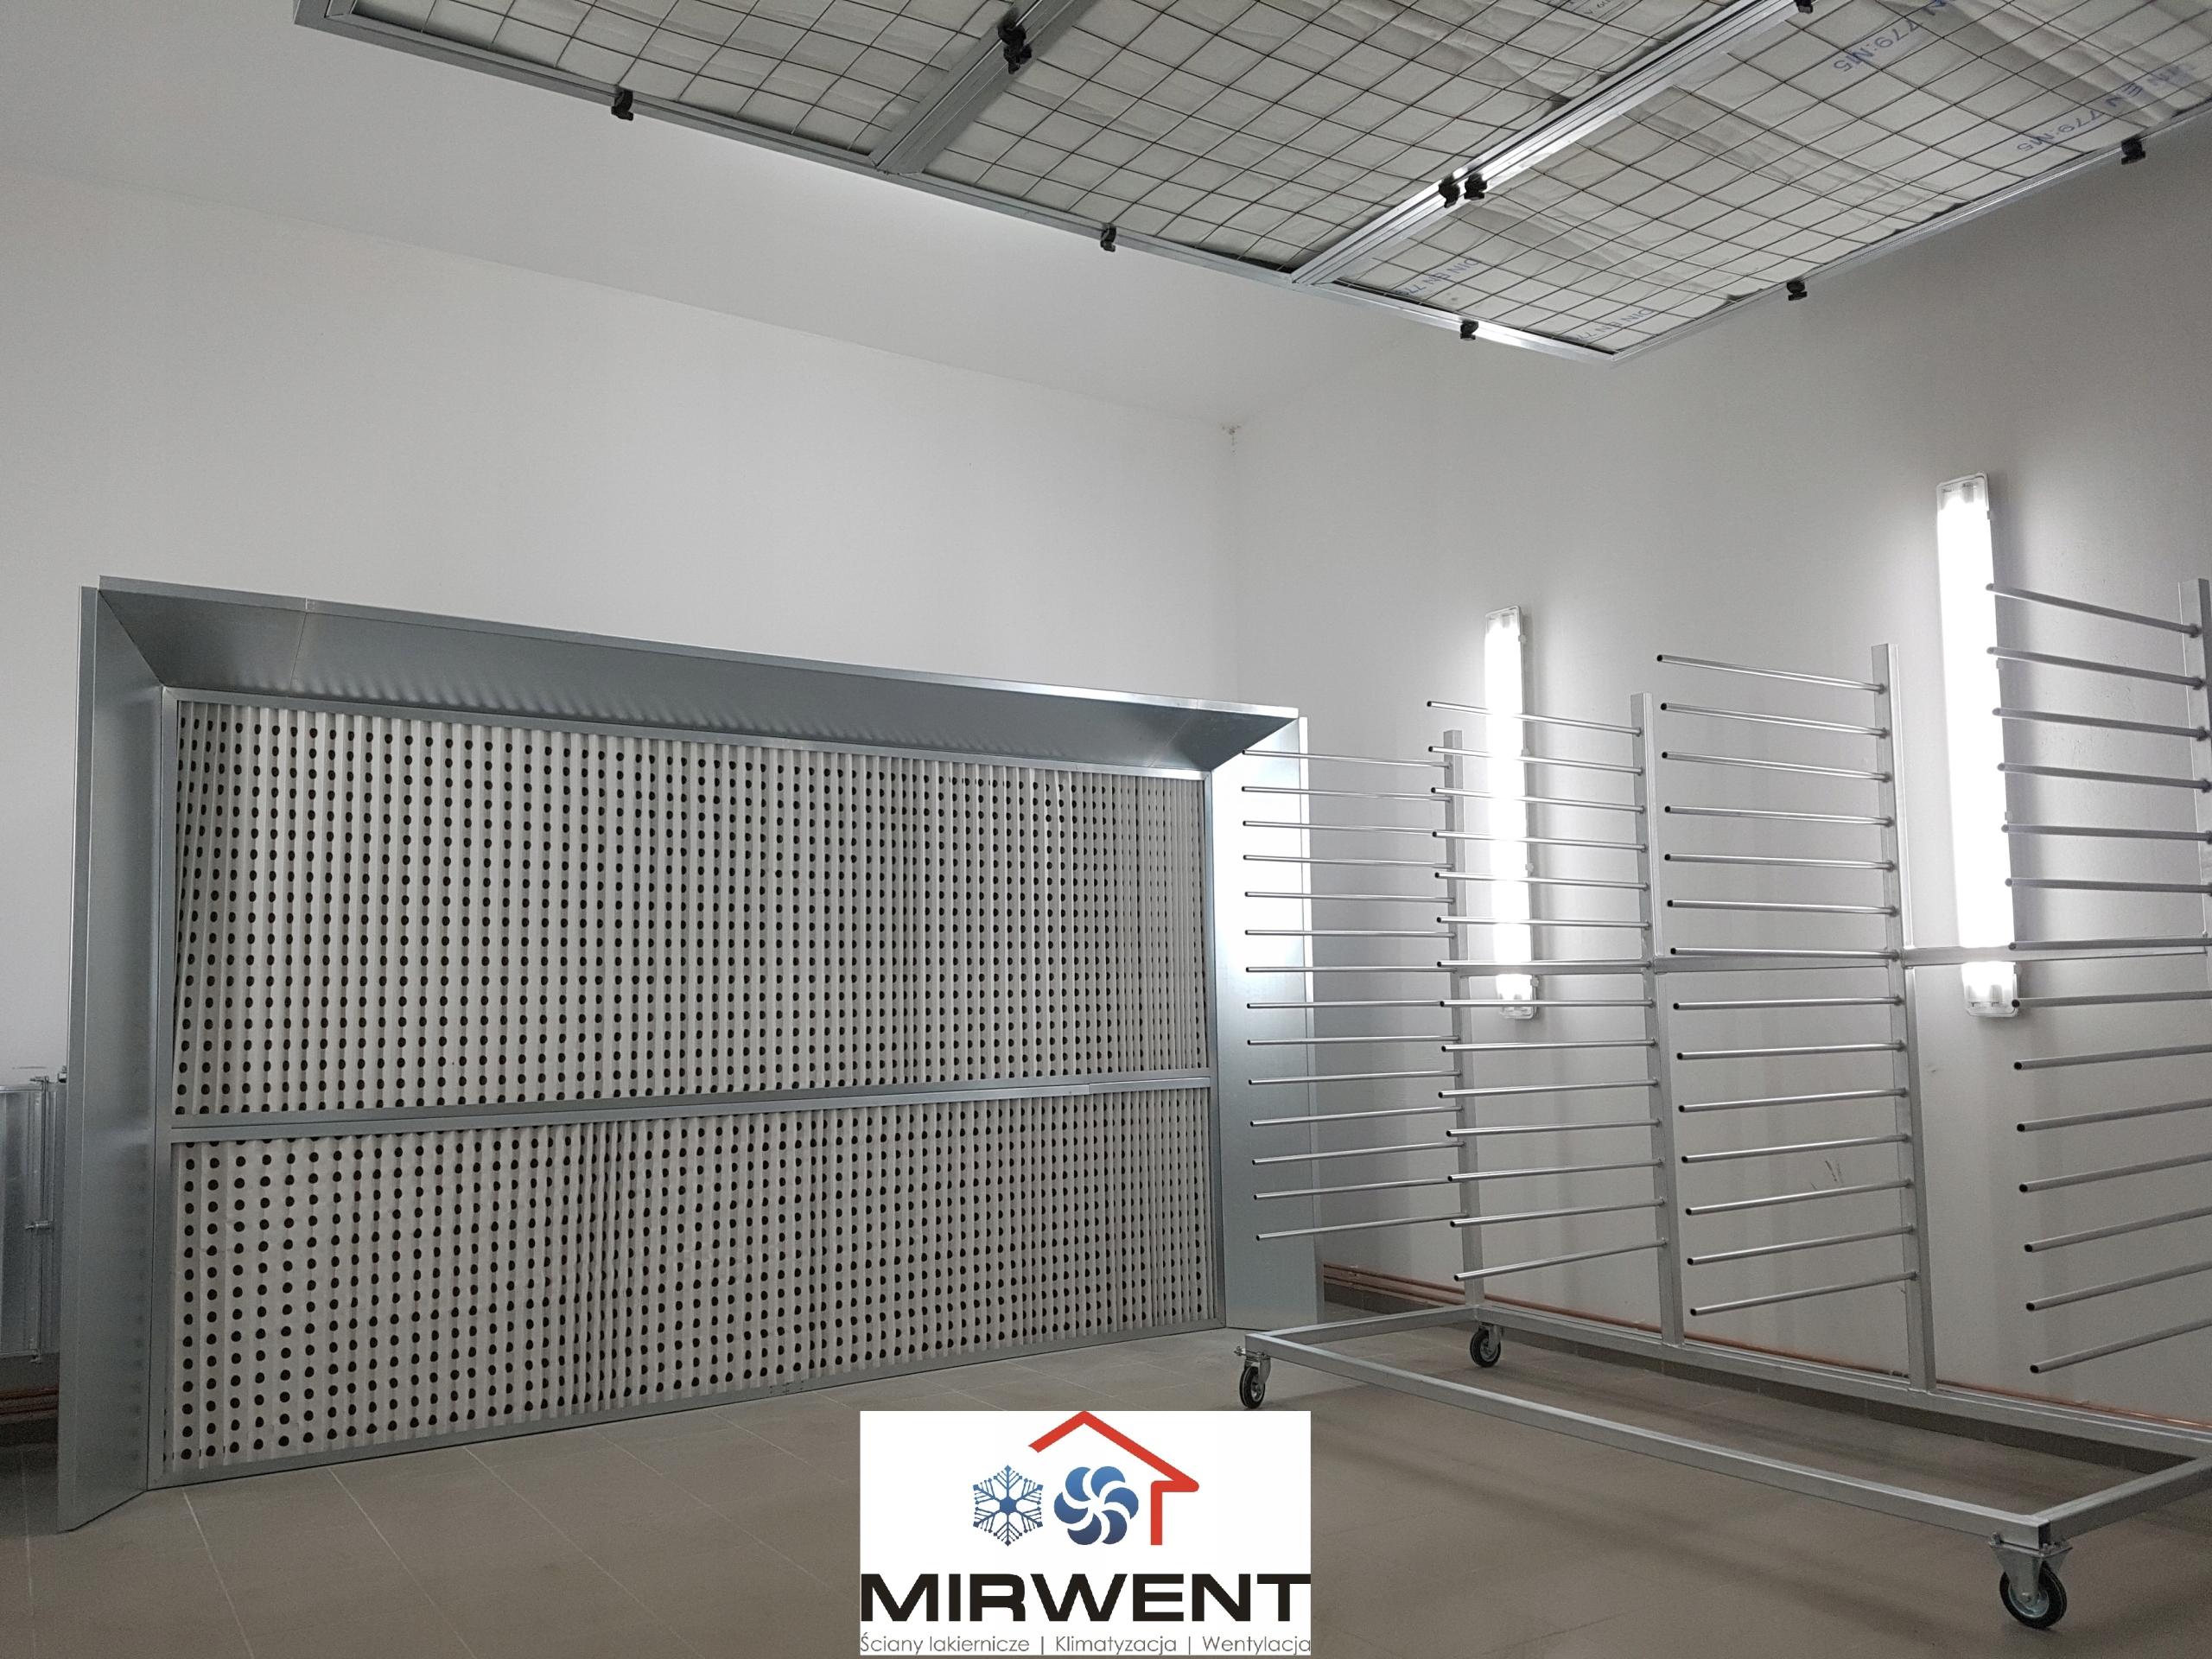 MIRWENT Paint Wall Немедленная реализация